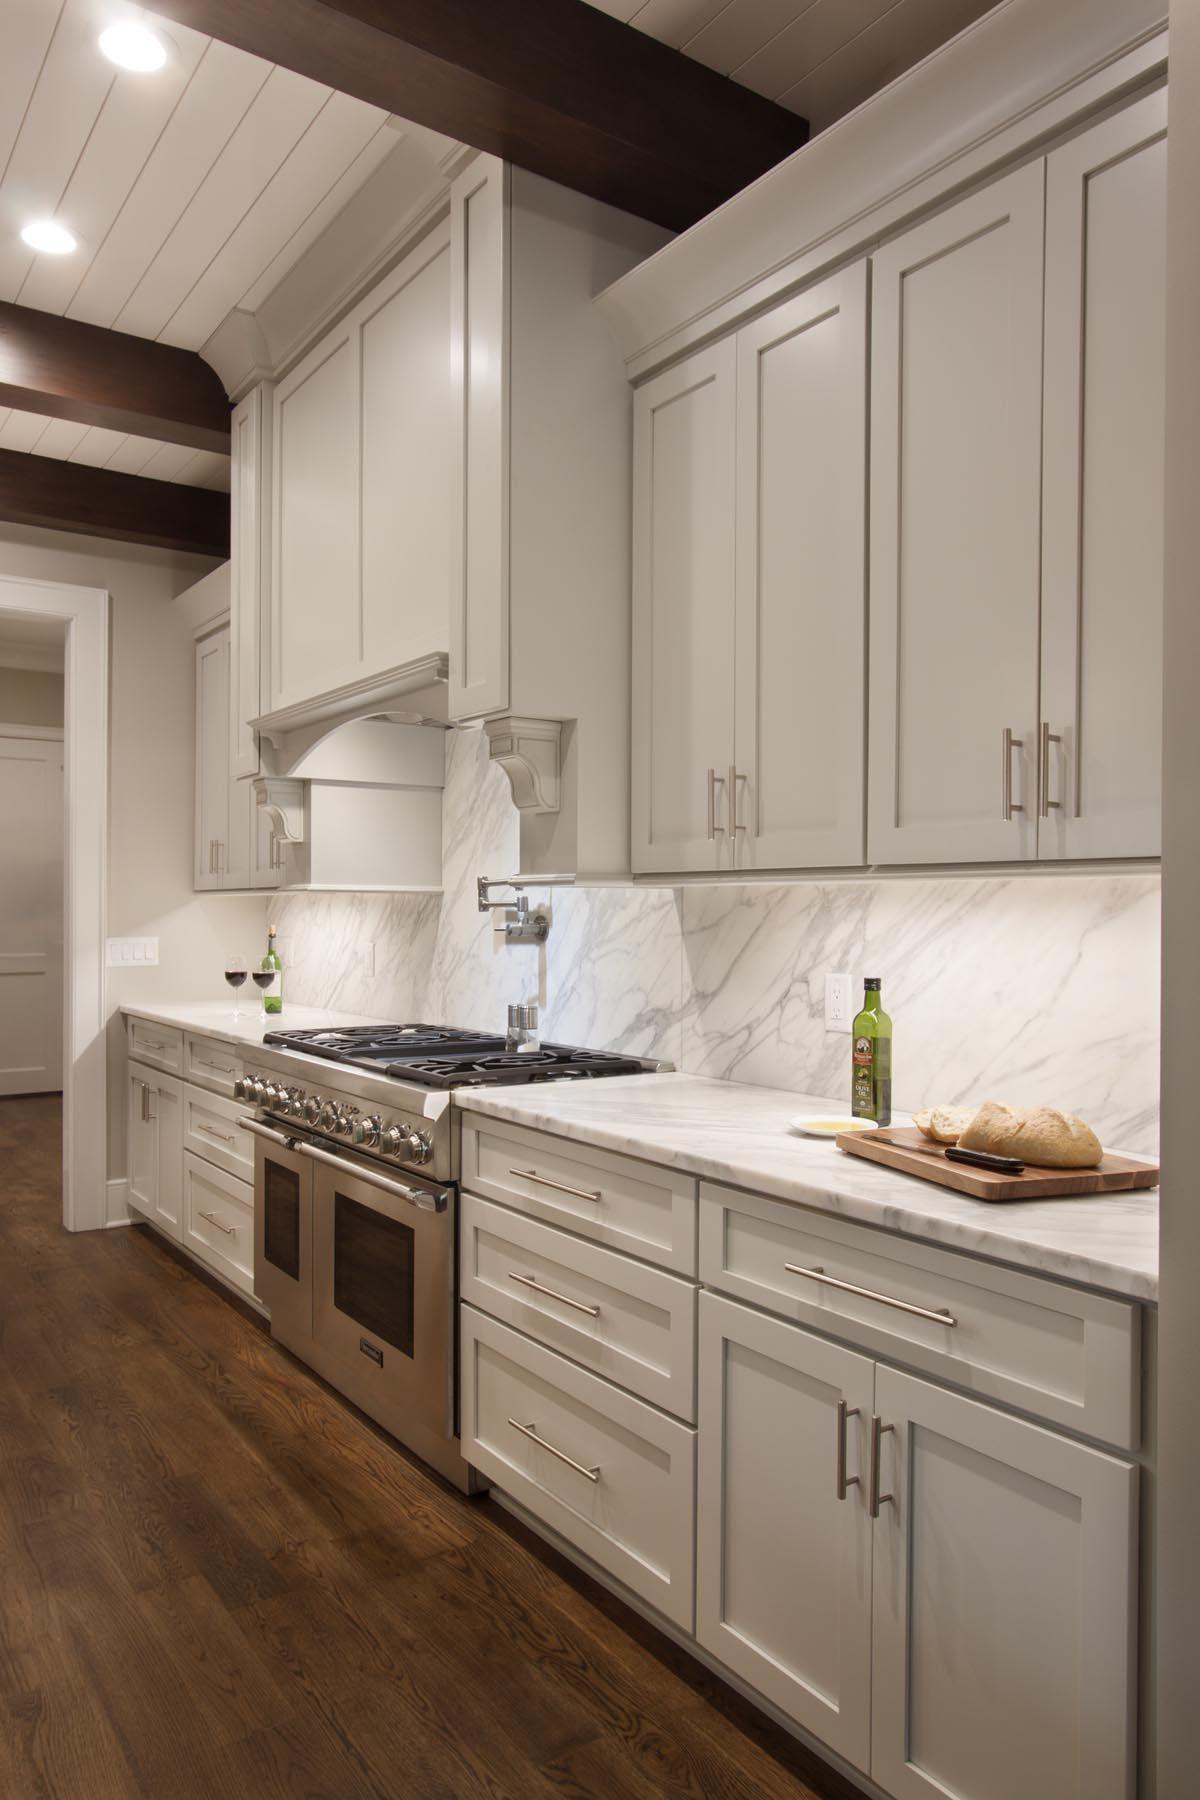 31 Luxury Calacatta Gold Marble Backsplash Countertop Ideas Backsplash Kitchen White Cabinets Marble Backsplash Kitchen White Kitchen Backsplash